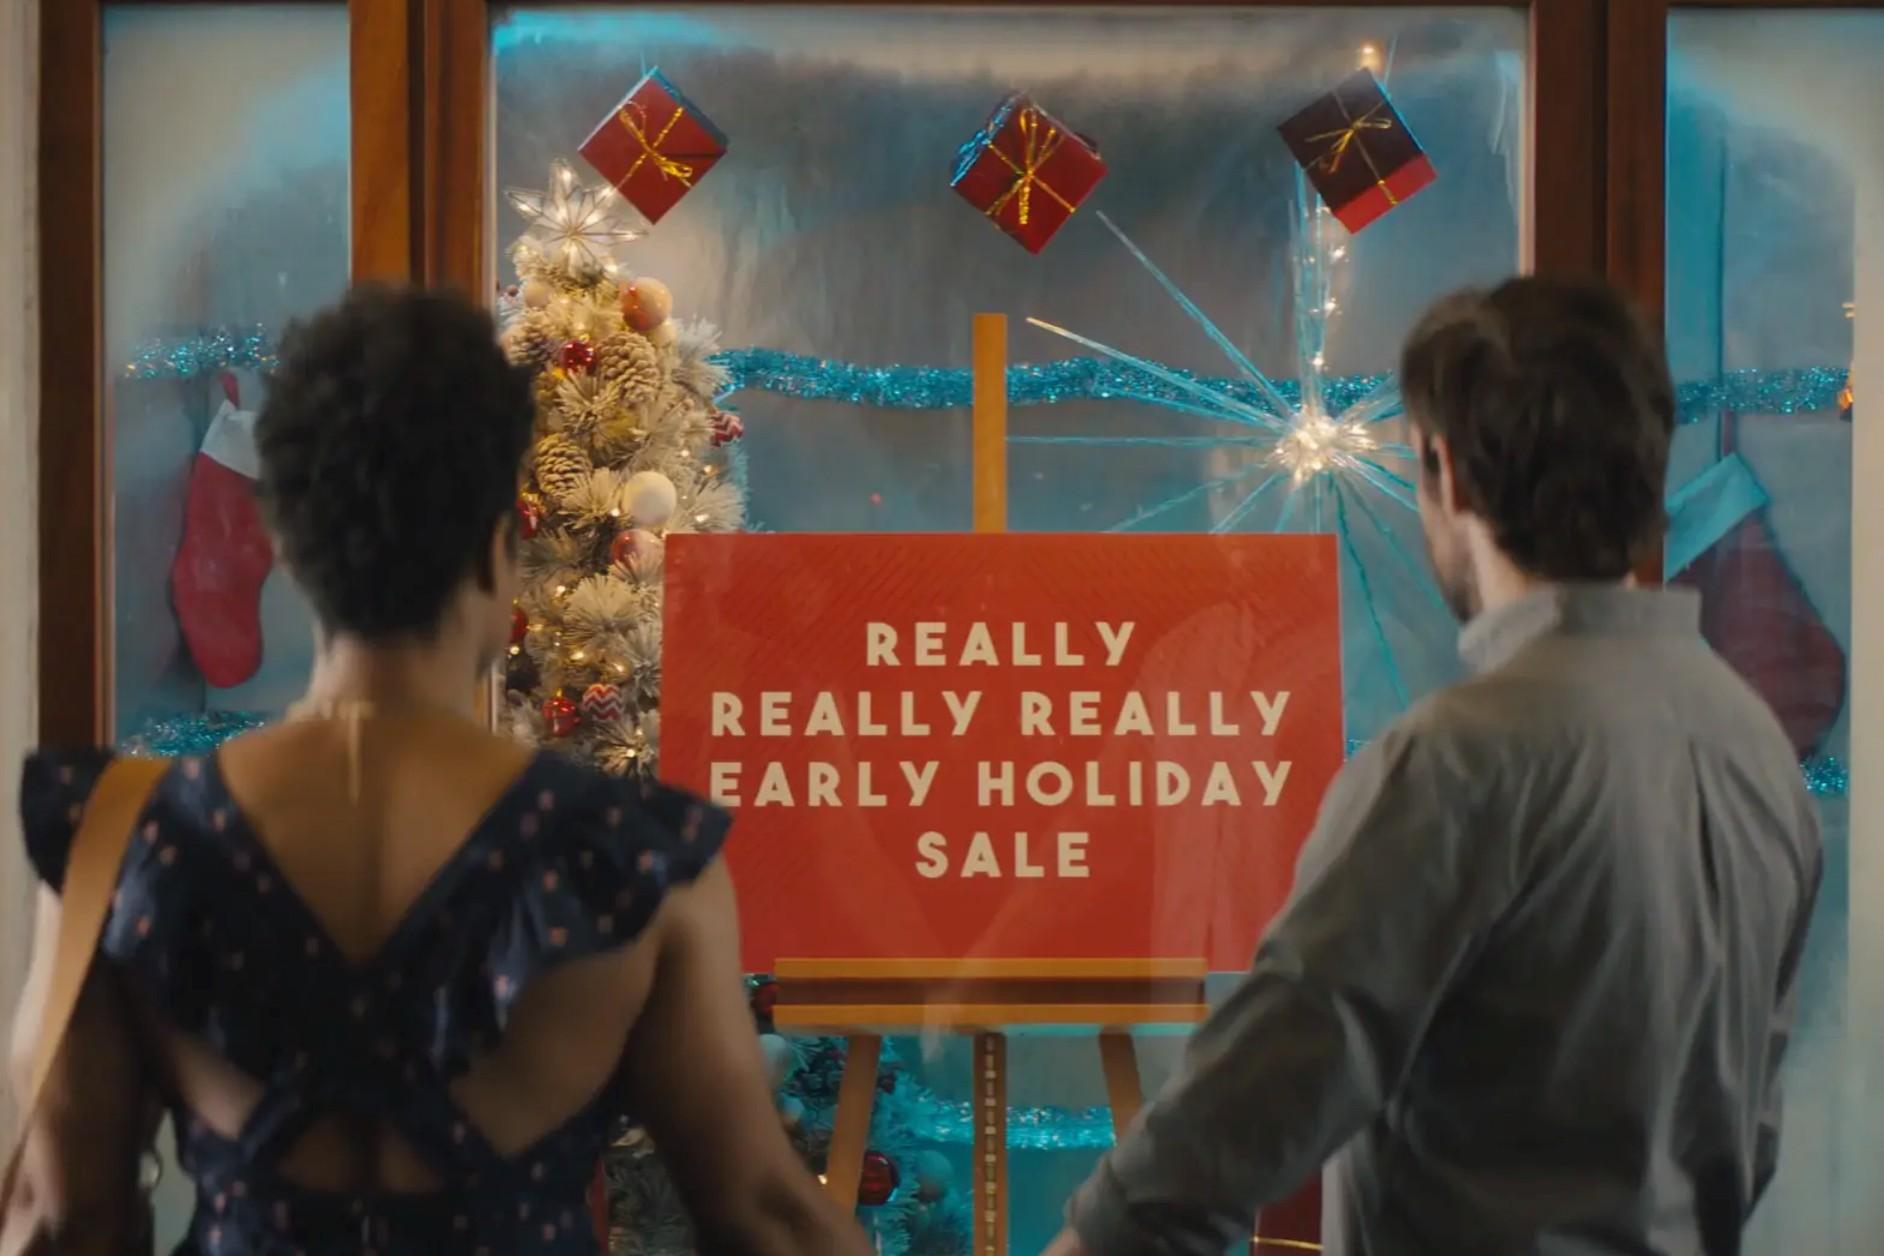 News about Amazon, eBay, Nike, the Emmy Awards, Netflix, 'Seinfeld': Wake-Up Call